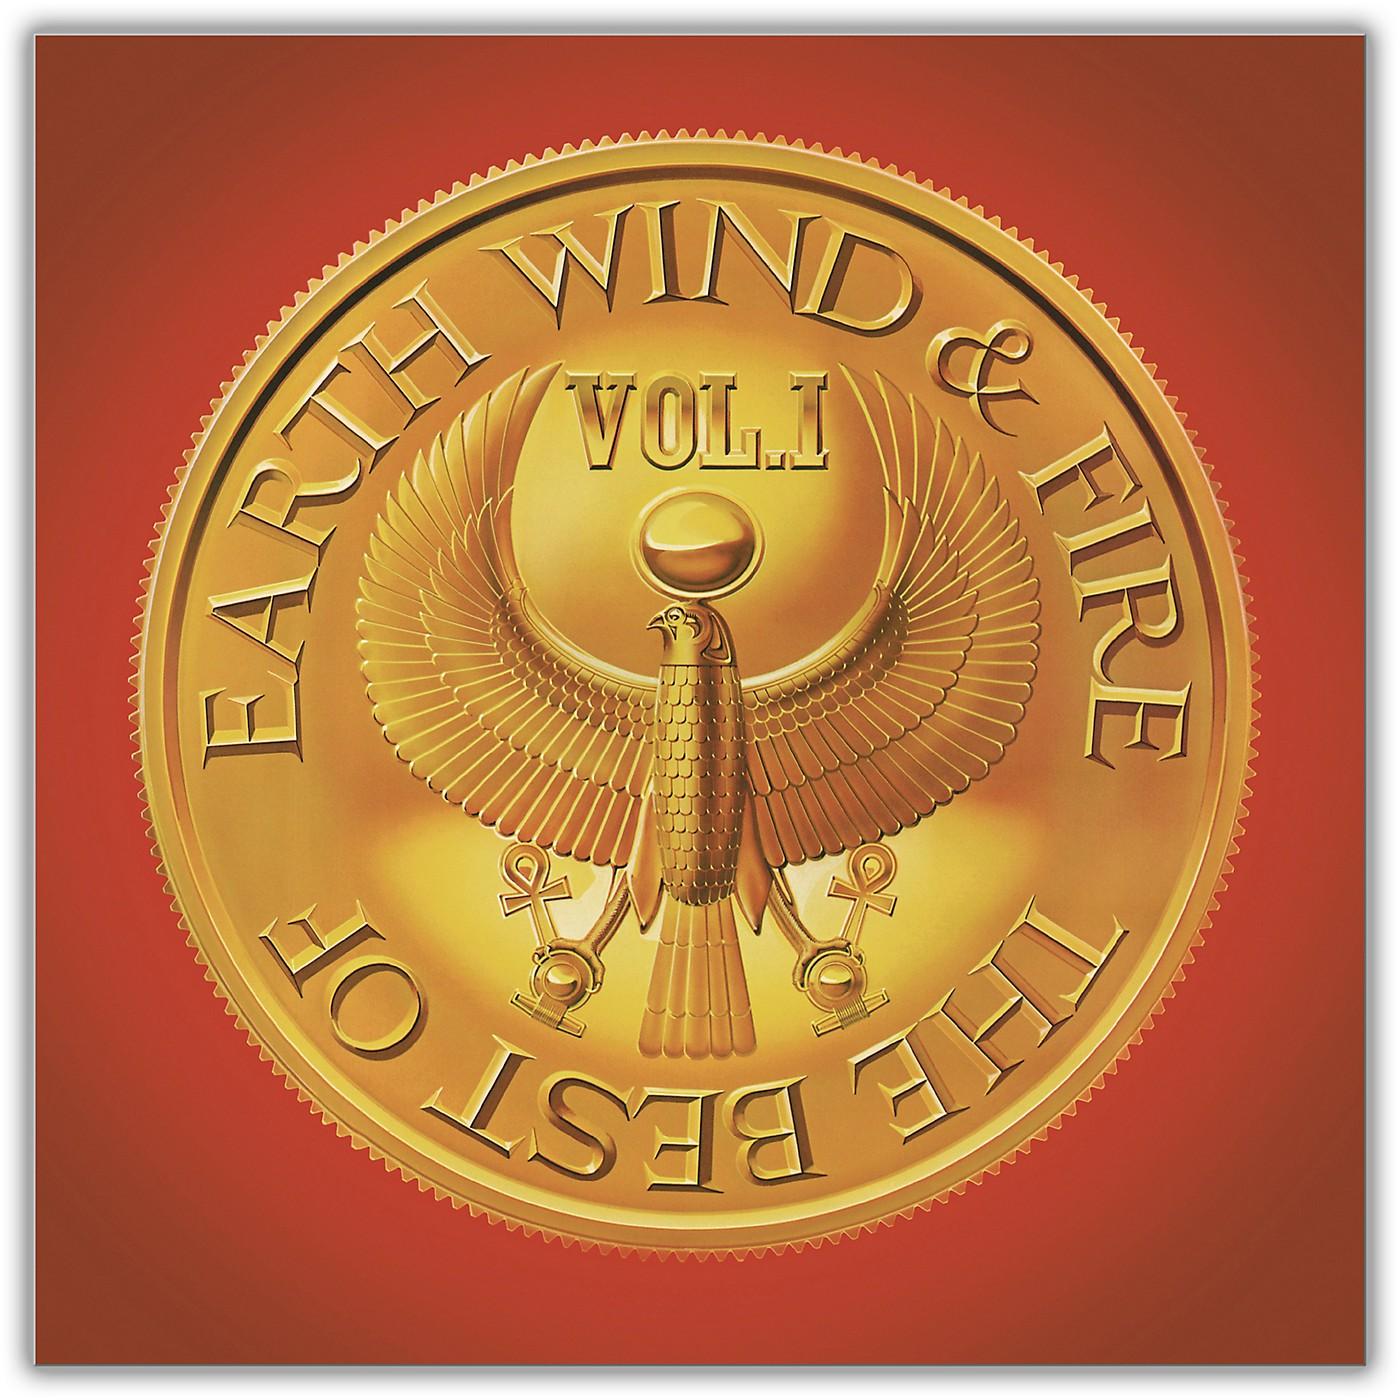 Sony Earth, Wind & Fire - Greatest Hits Vol 1 (1978) Vinyl LP thumbnail